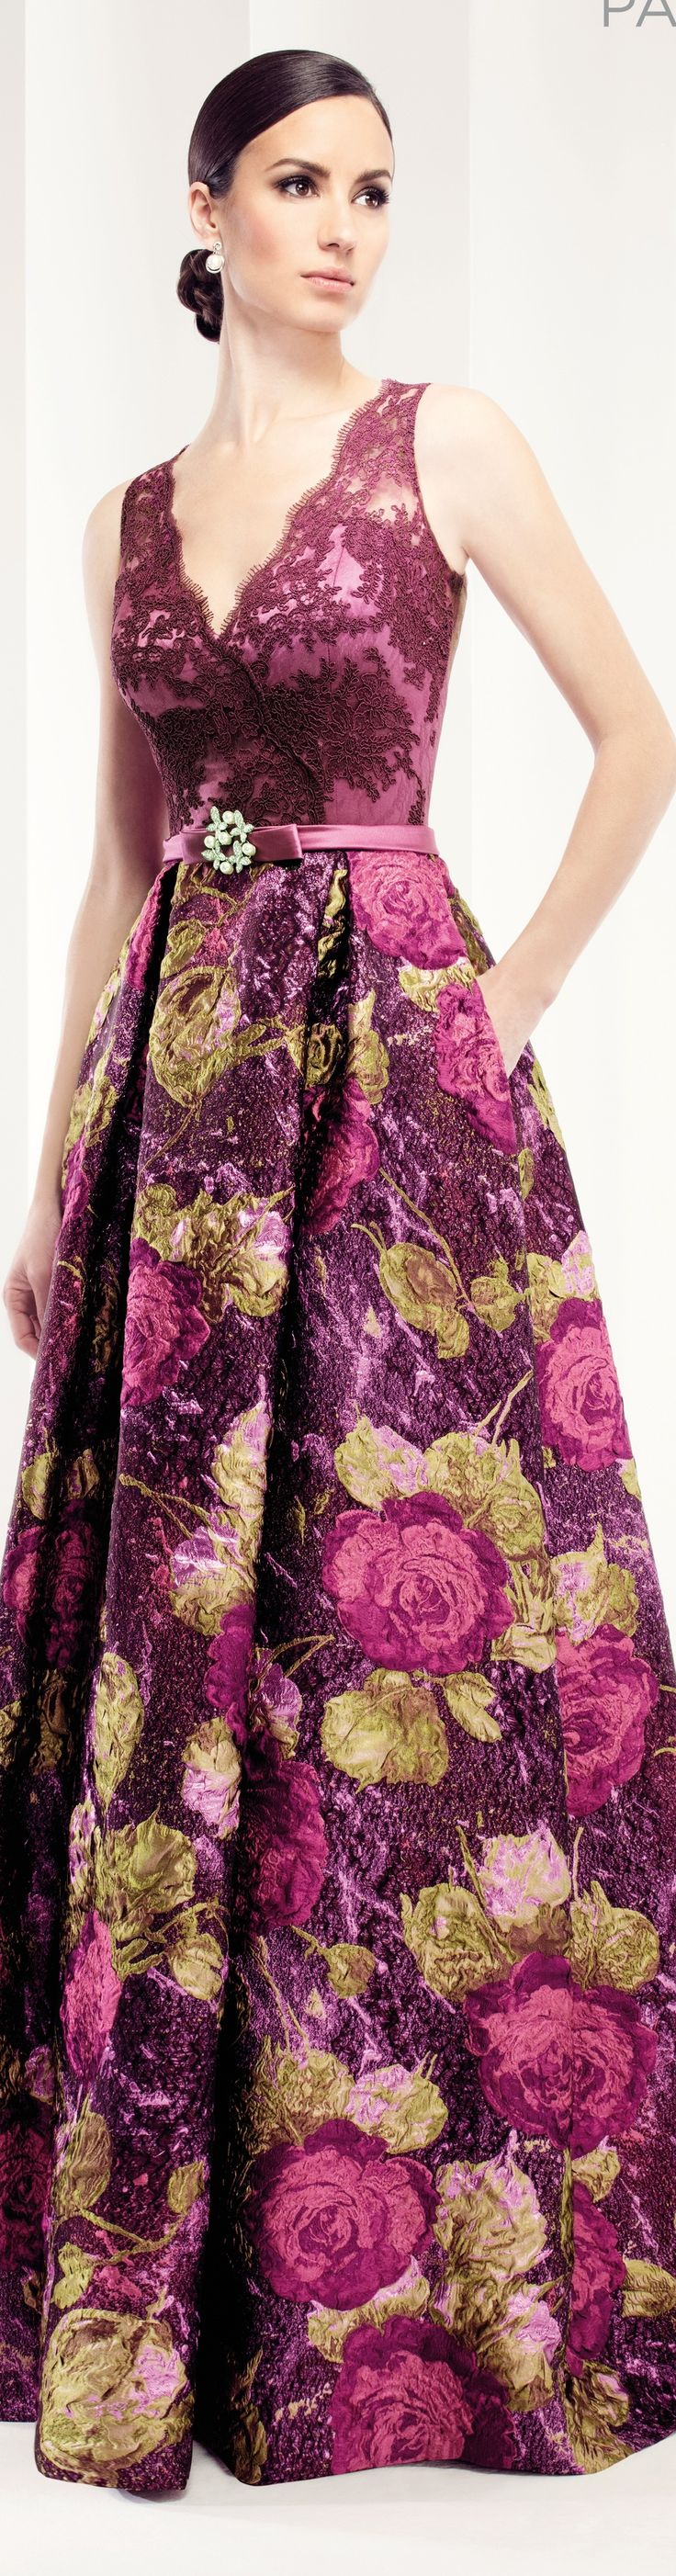 Patricia Avendano women fashion outfit clothing style apparel @roressclothes closet ideas